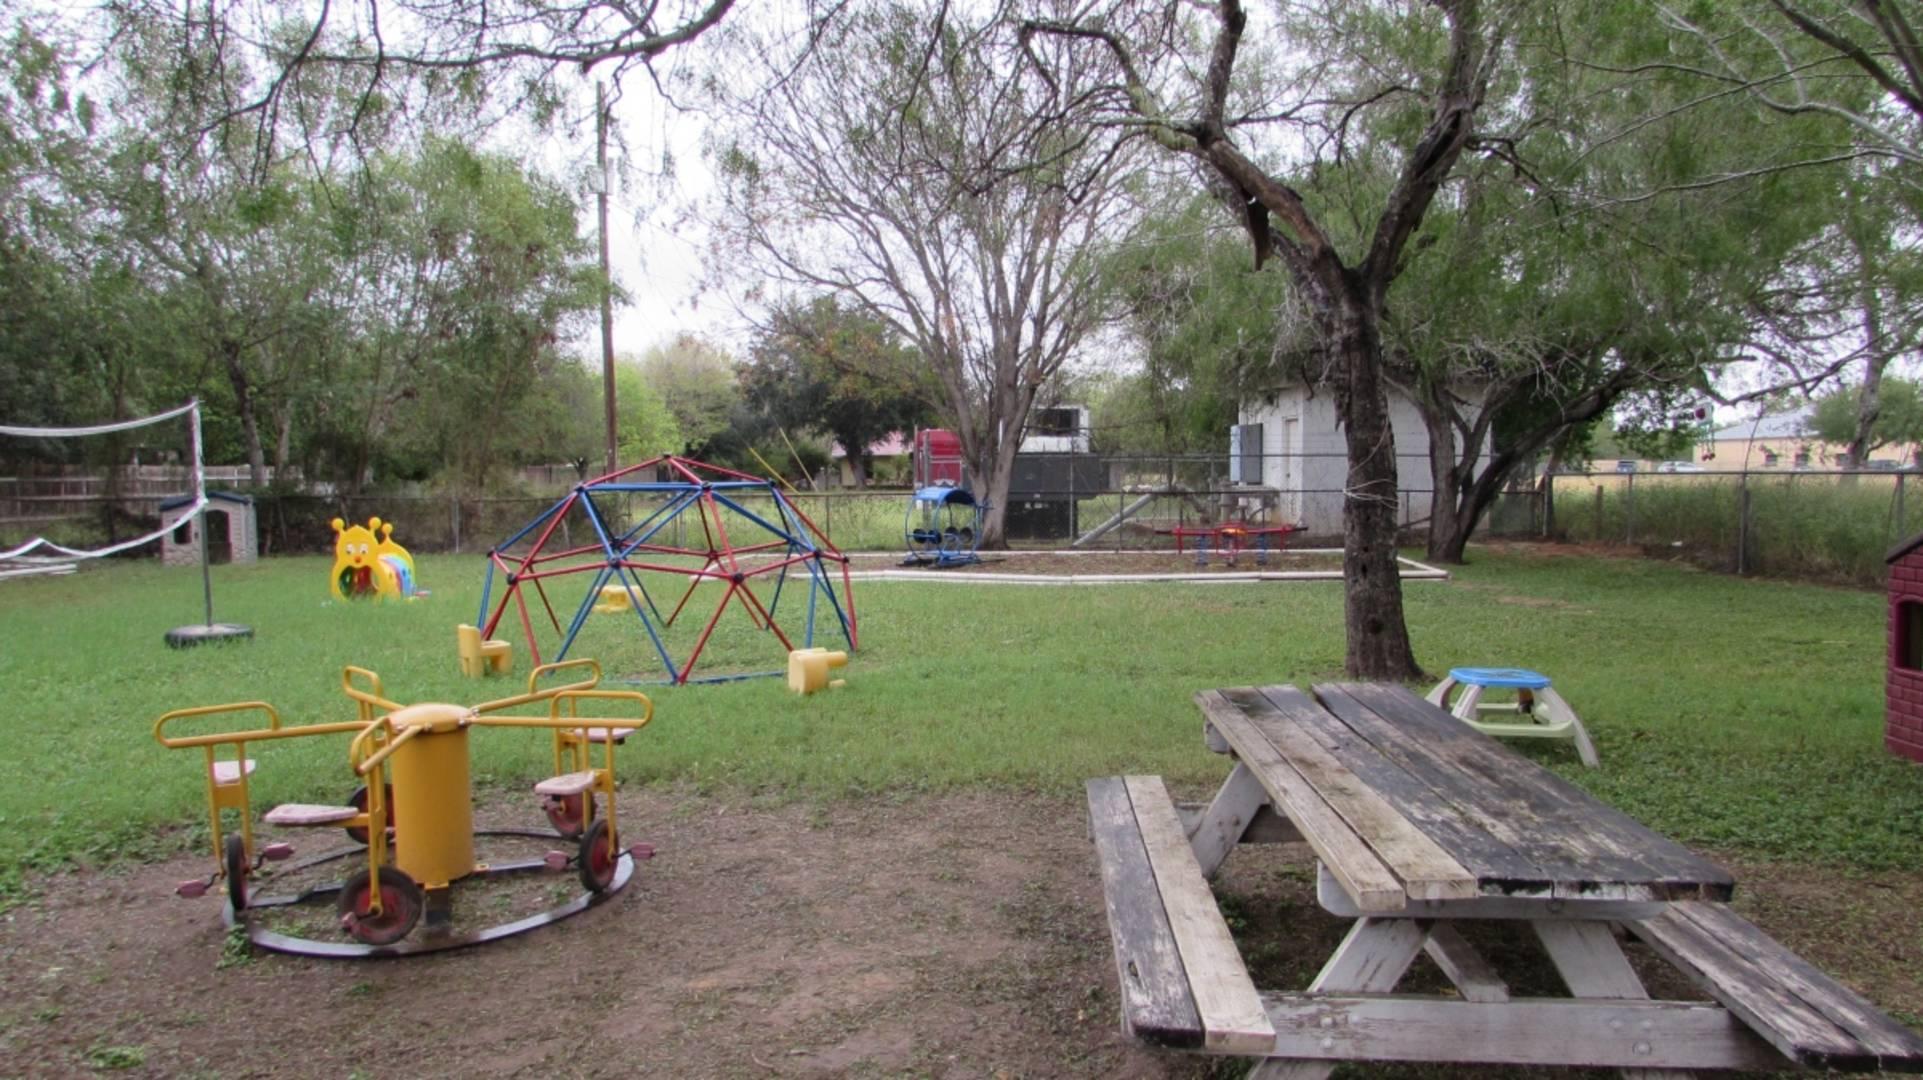 746 N. Alamo Road Alamo, TX 78516